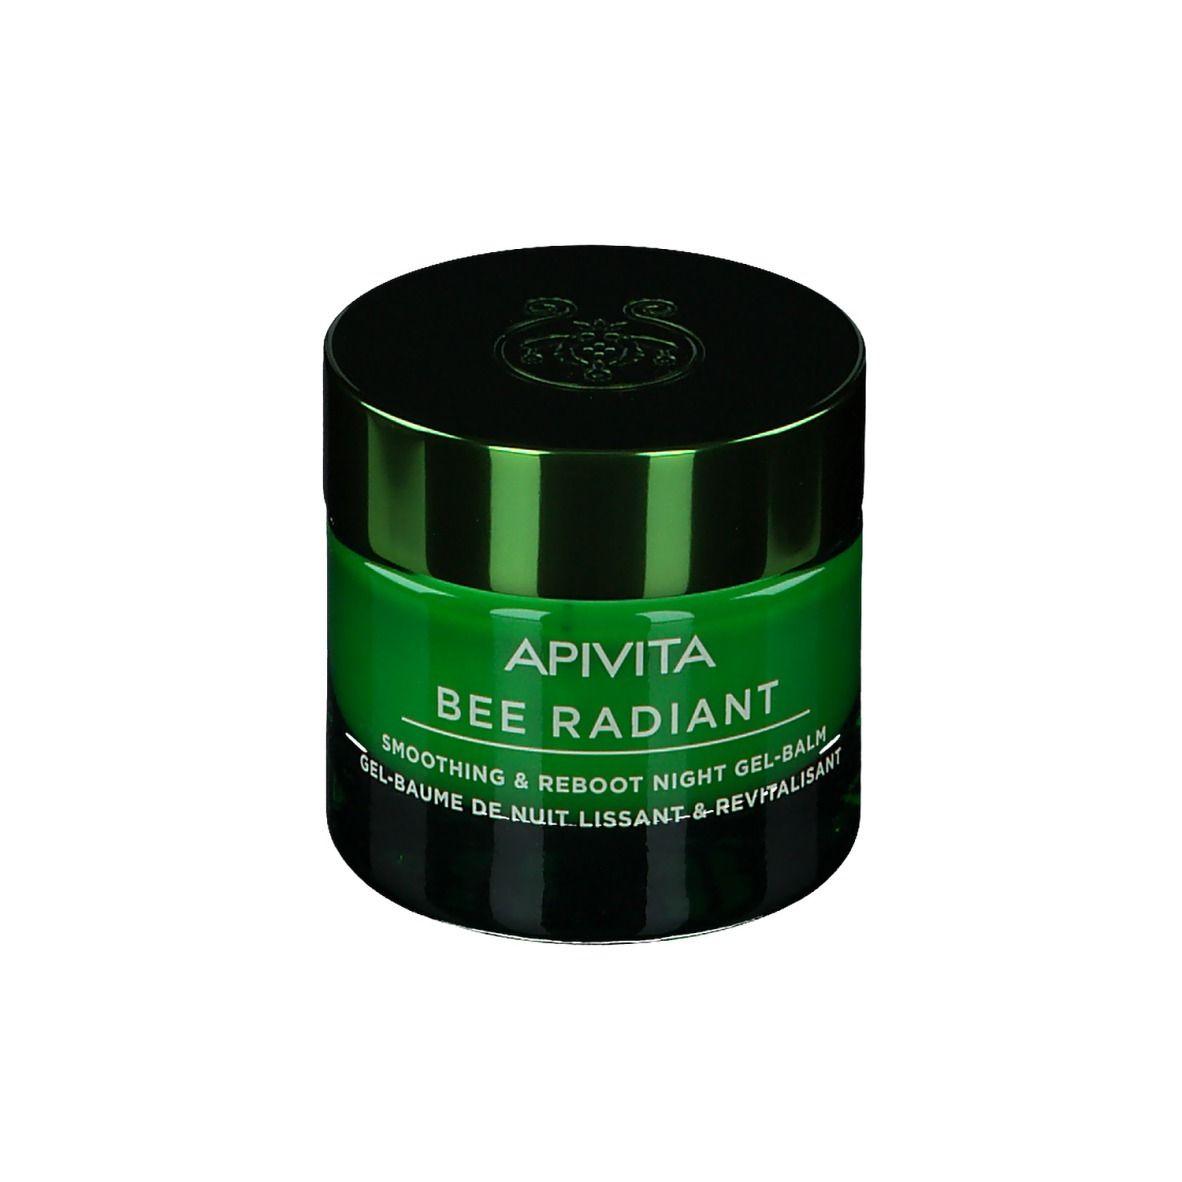 Image of APIVITA Bee Radiant Smoothing & Reboot Nacht Gelbalsam